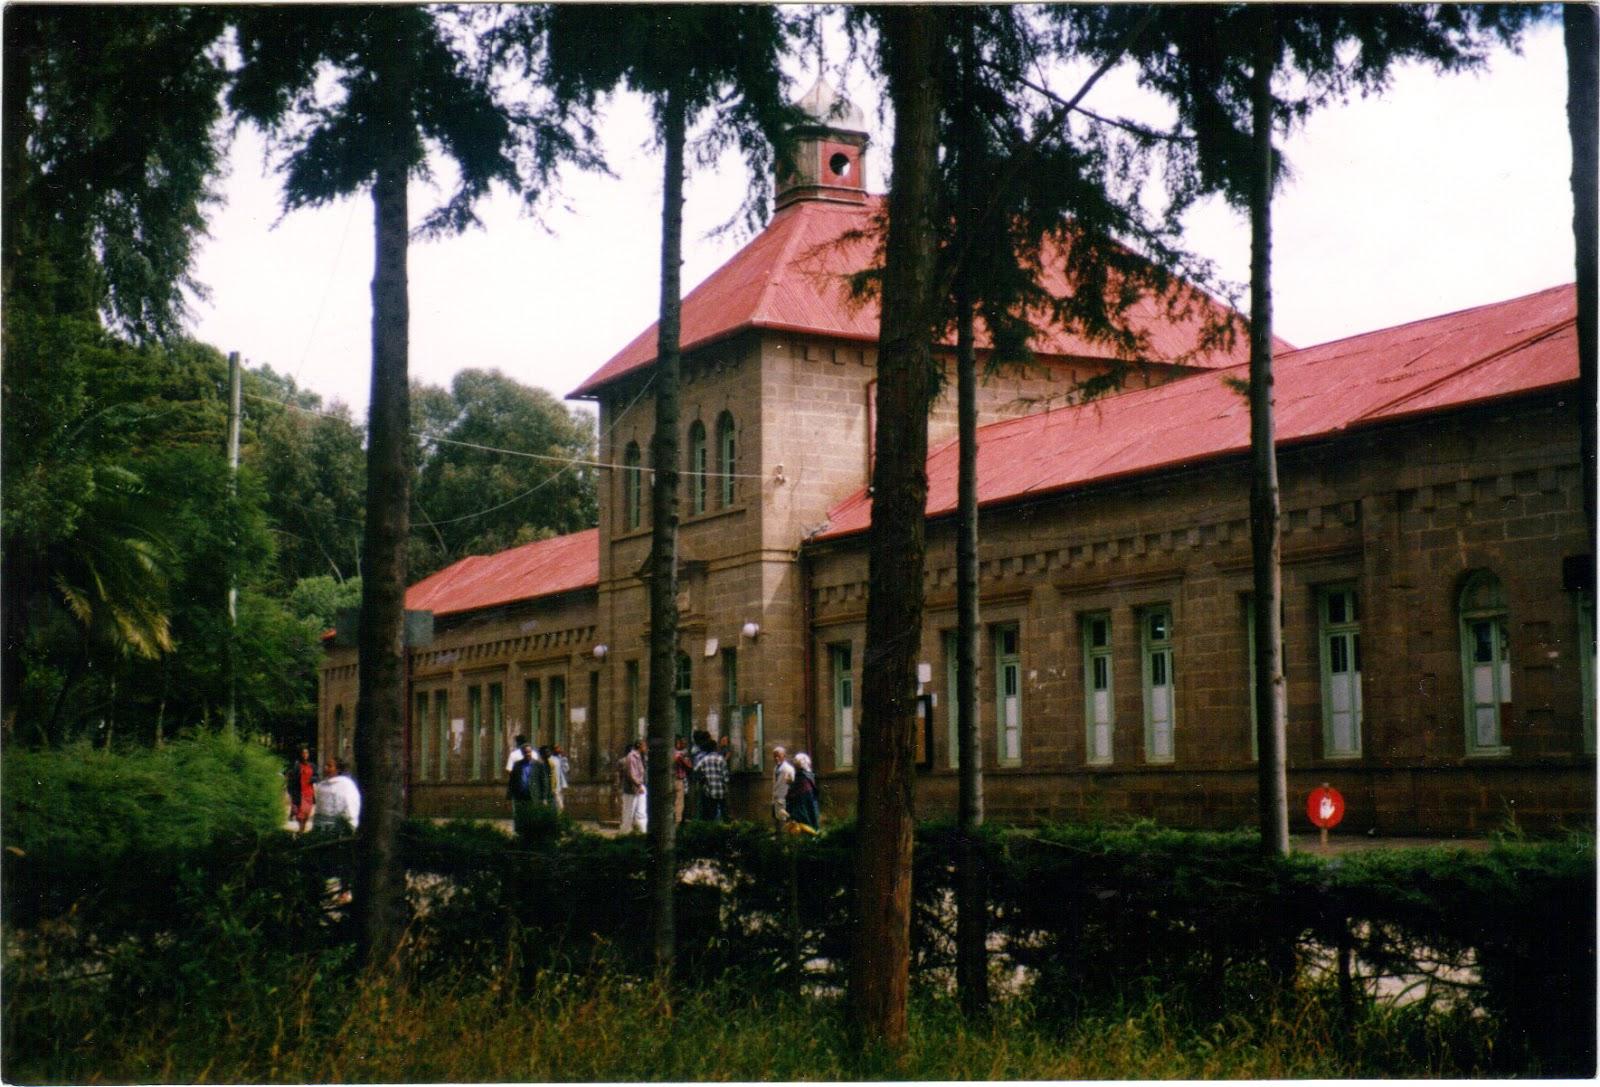 TMS (Tafari Makonnen School, Addis Ababa, Ethiopia)